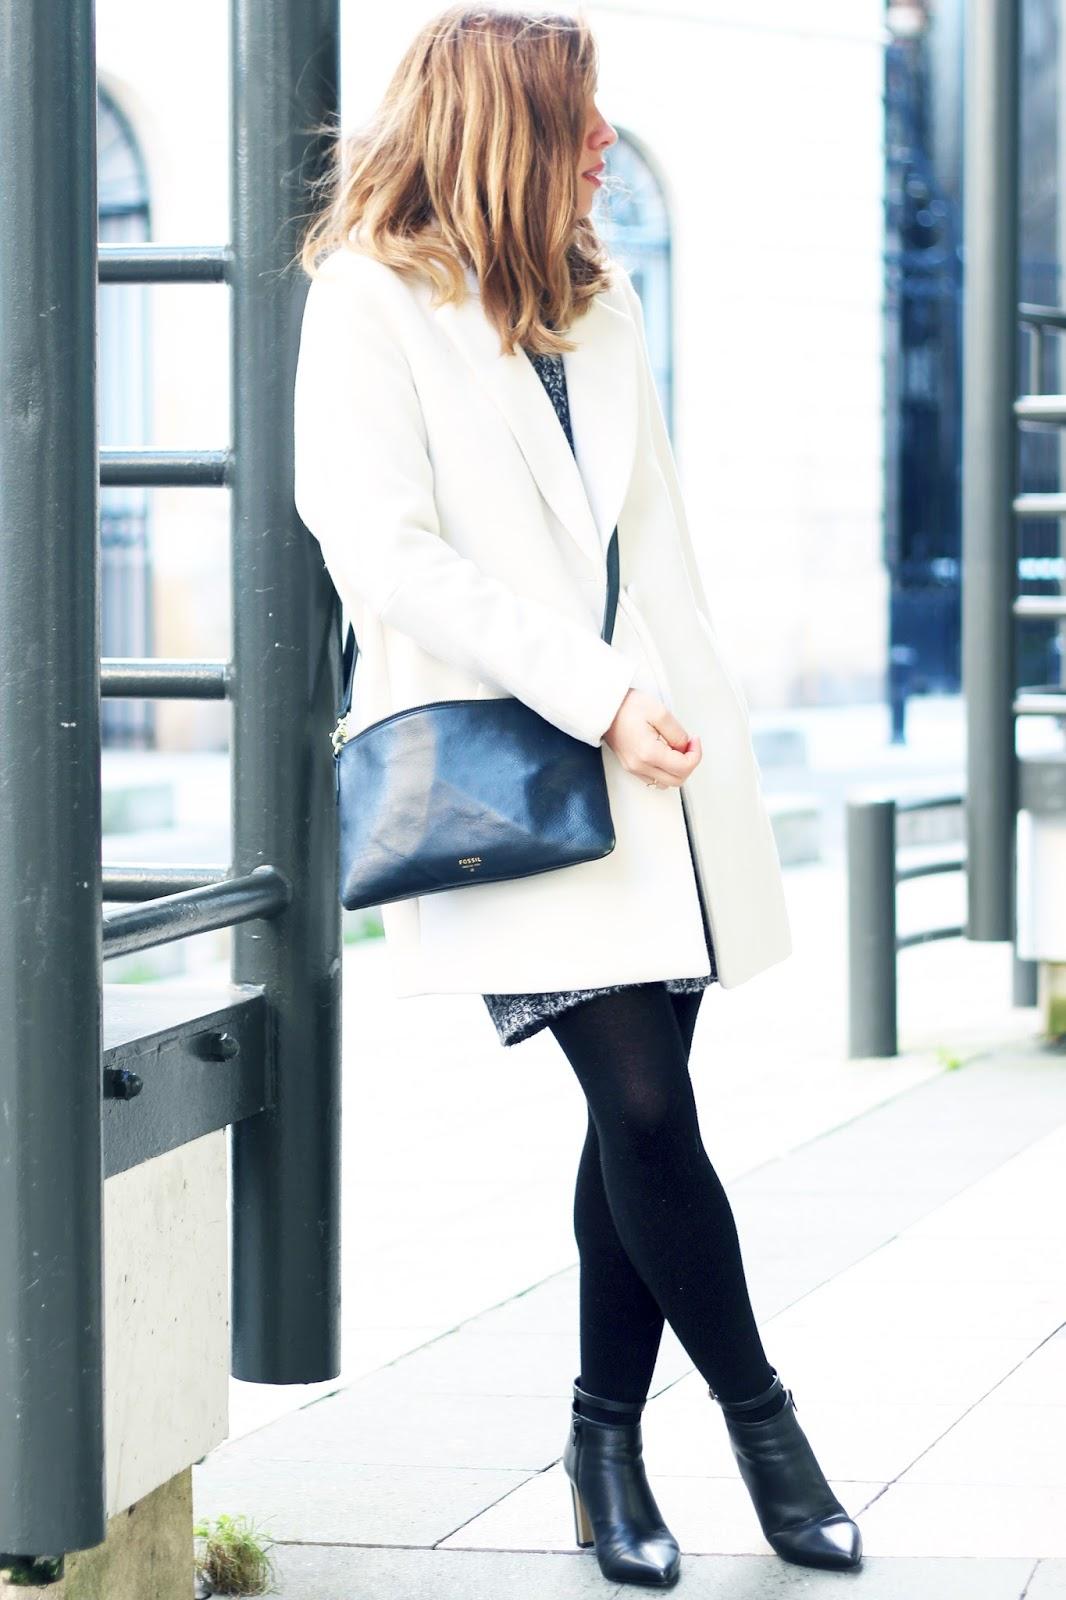 tenue blanc hiver blog mode la penderie de chloe. Black Bedroom Furniture Sets. Home Design Ideas